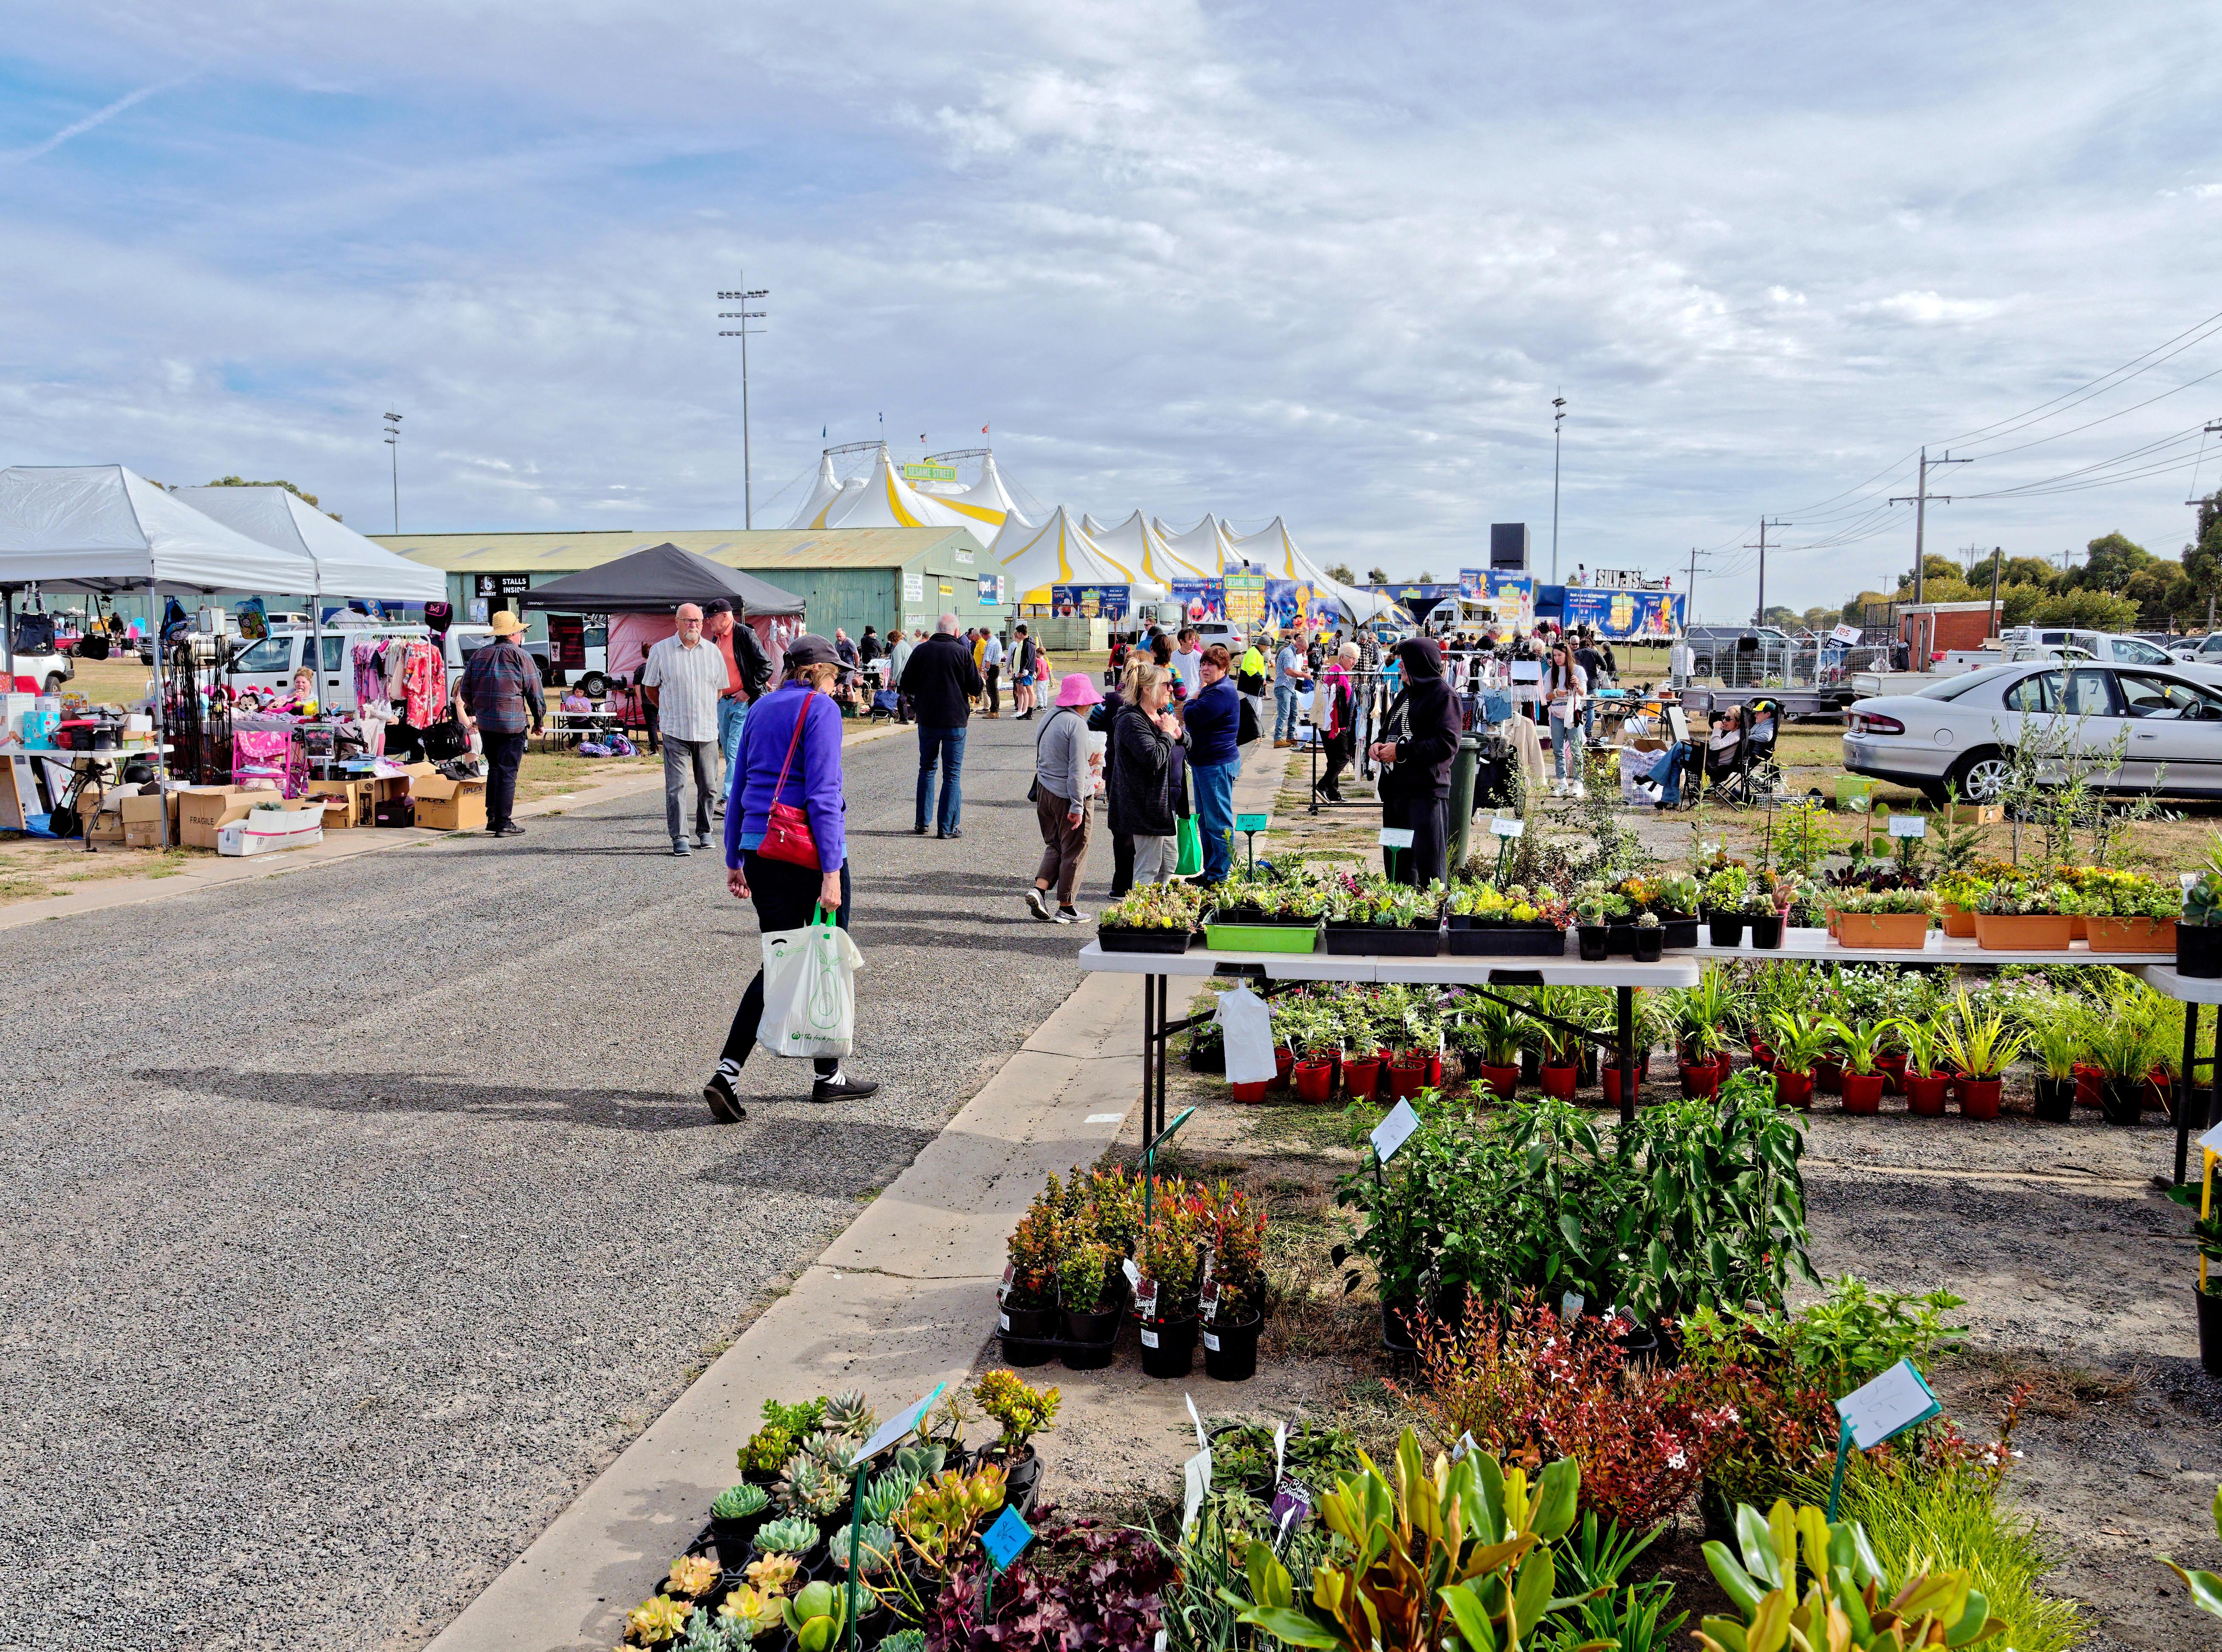 This should be Ballarat-Market-7.jpeg.  Is it missing?